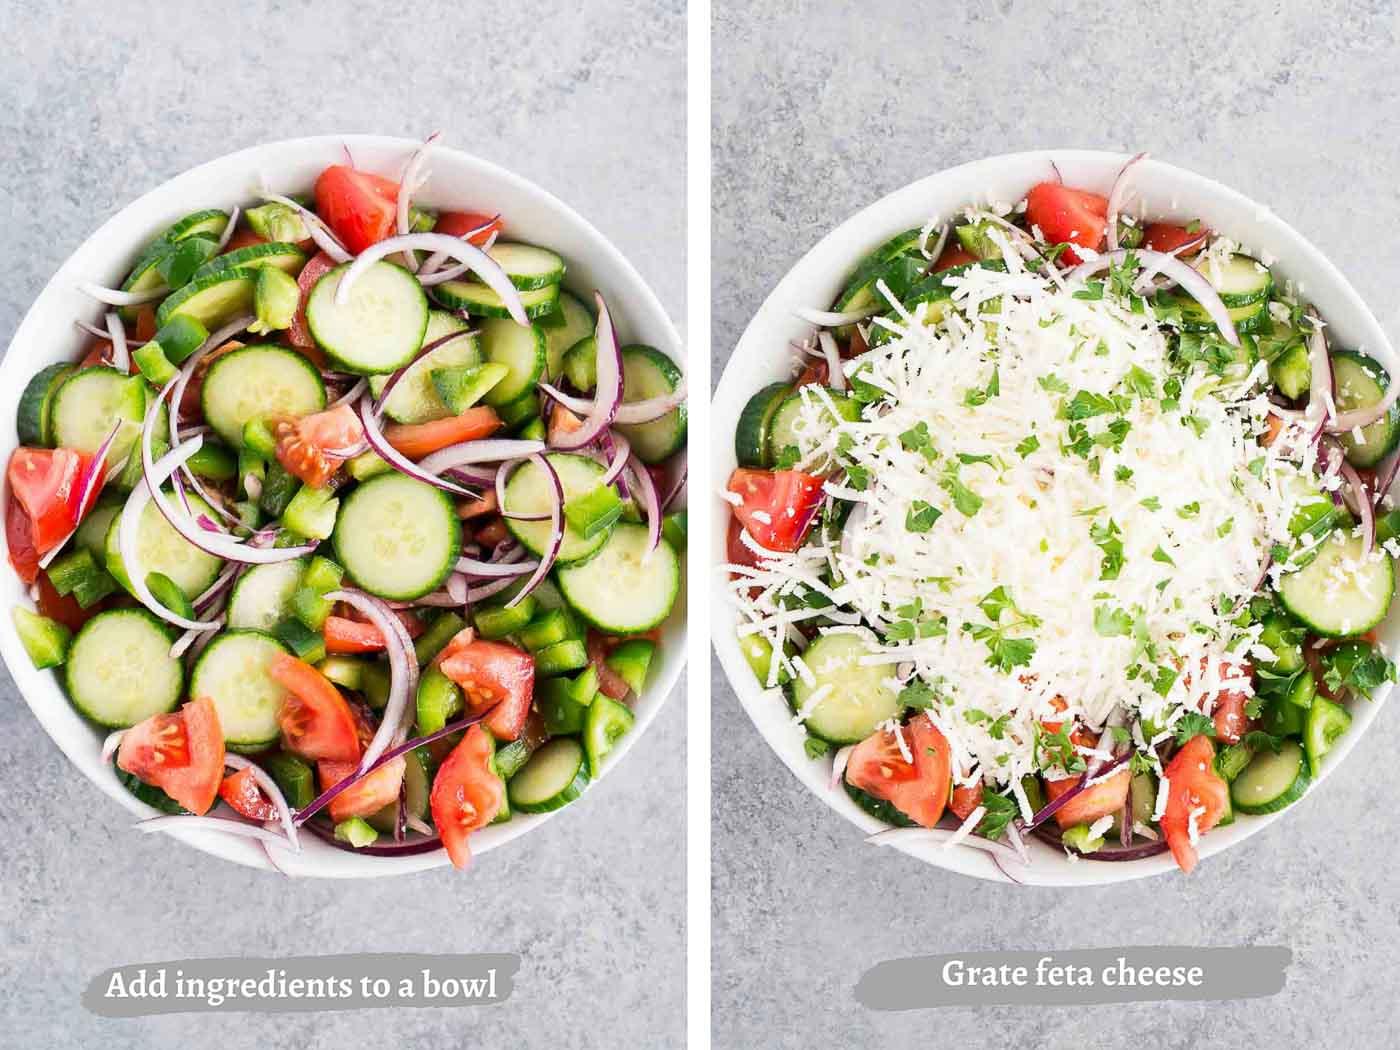 how to make shopska salad - process images